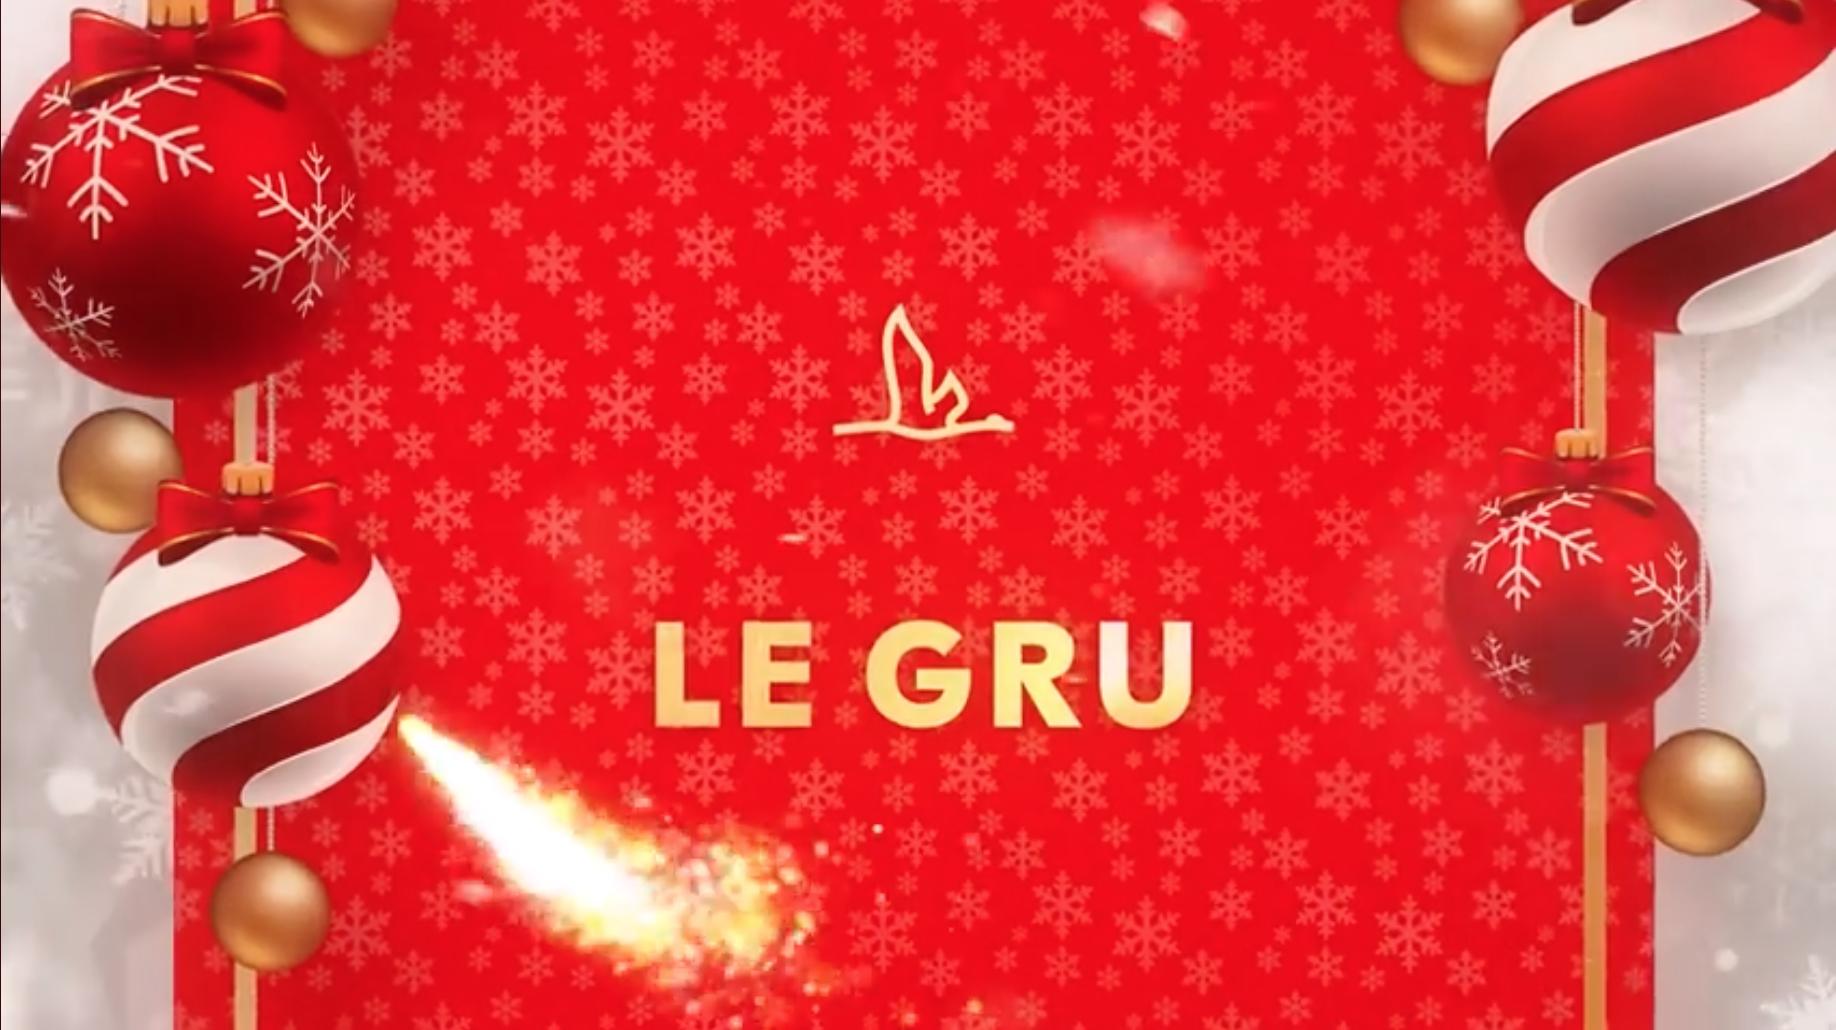 Le Gru Shoppingville (Buon Natale 2017)